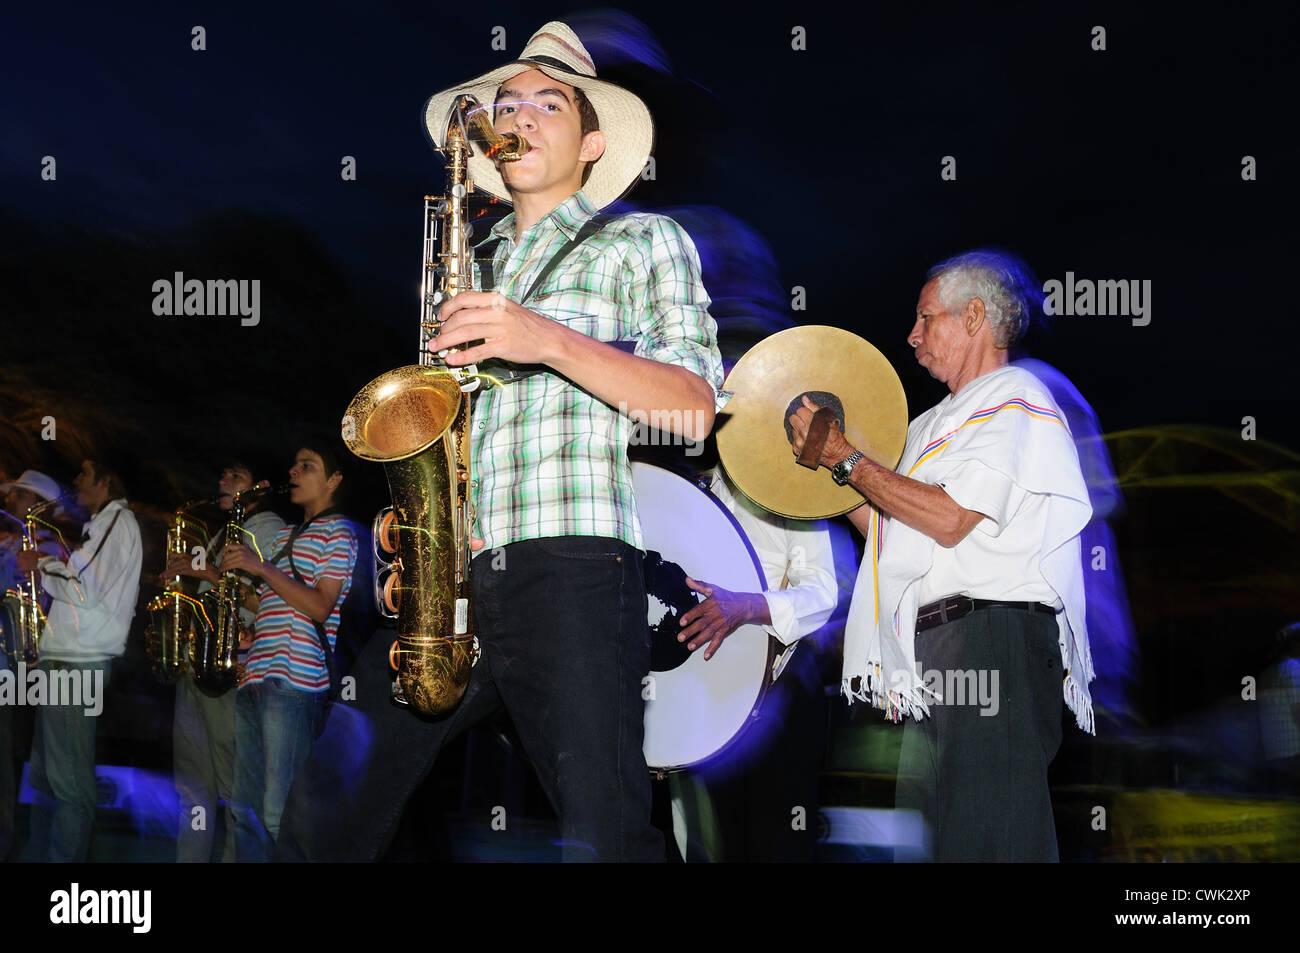 ' Festival del Sanjuanero Huilense ' in RIVERA . Department of Huila. COLOMBIA - Stock Image